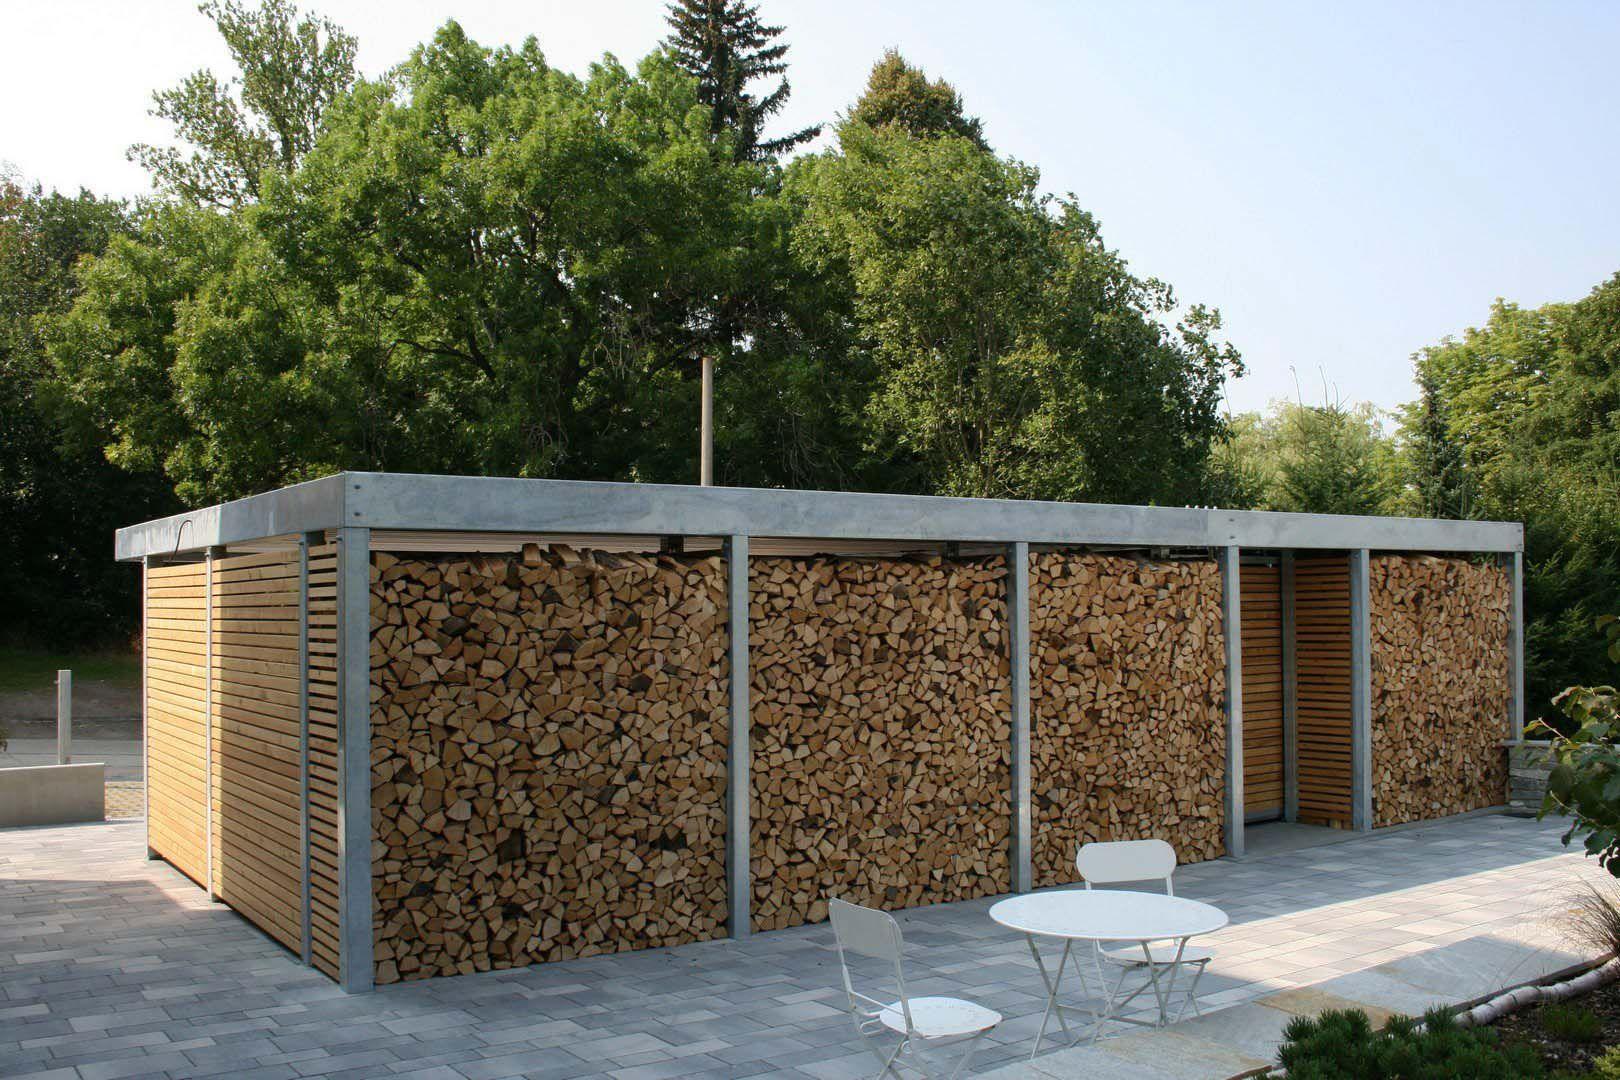 Design Metall Carport aus Holz verzinkt Stahl mit